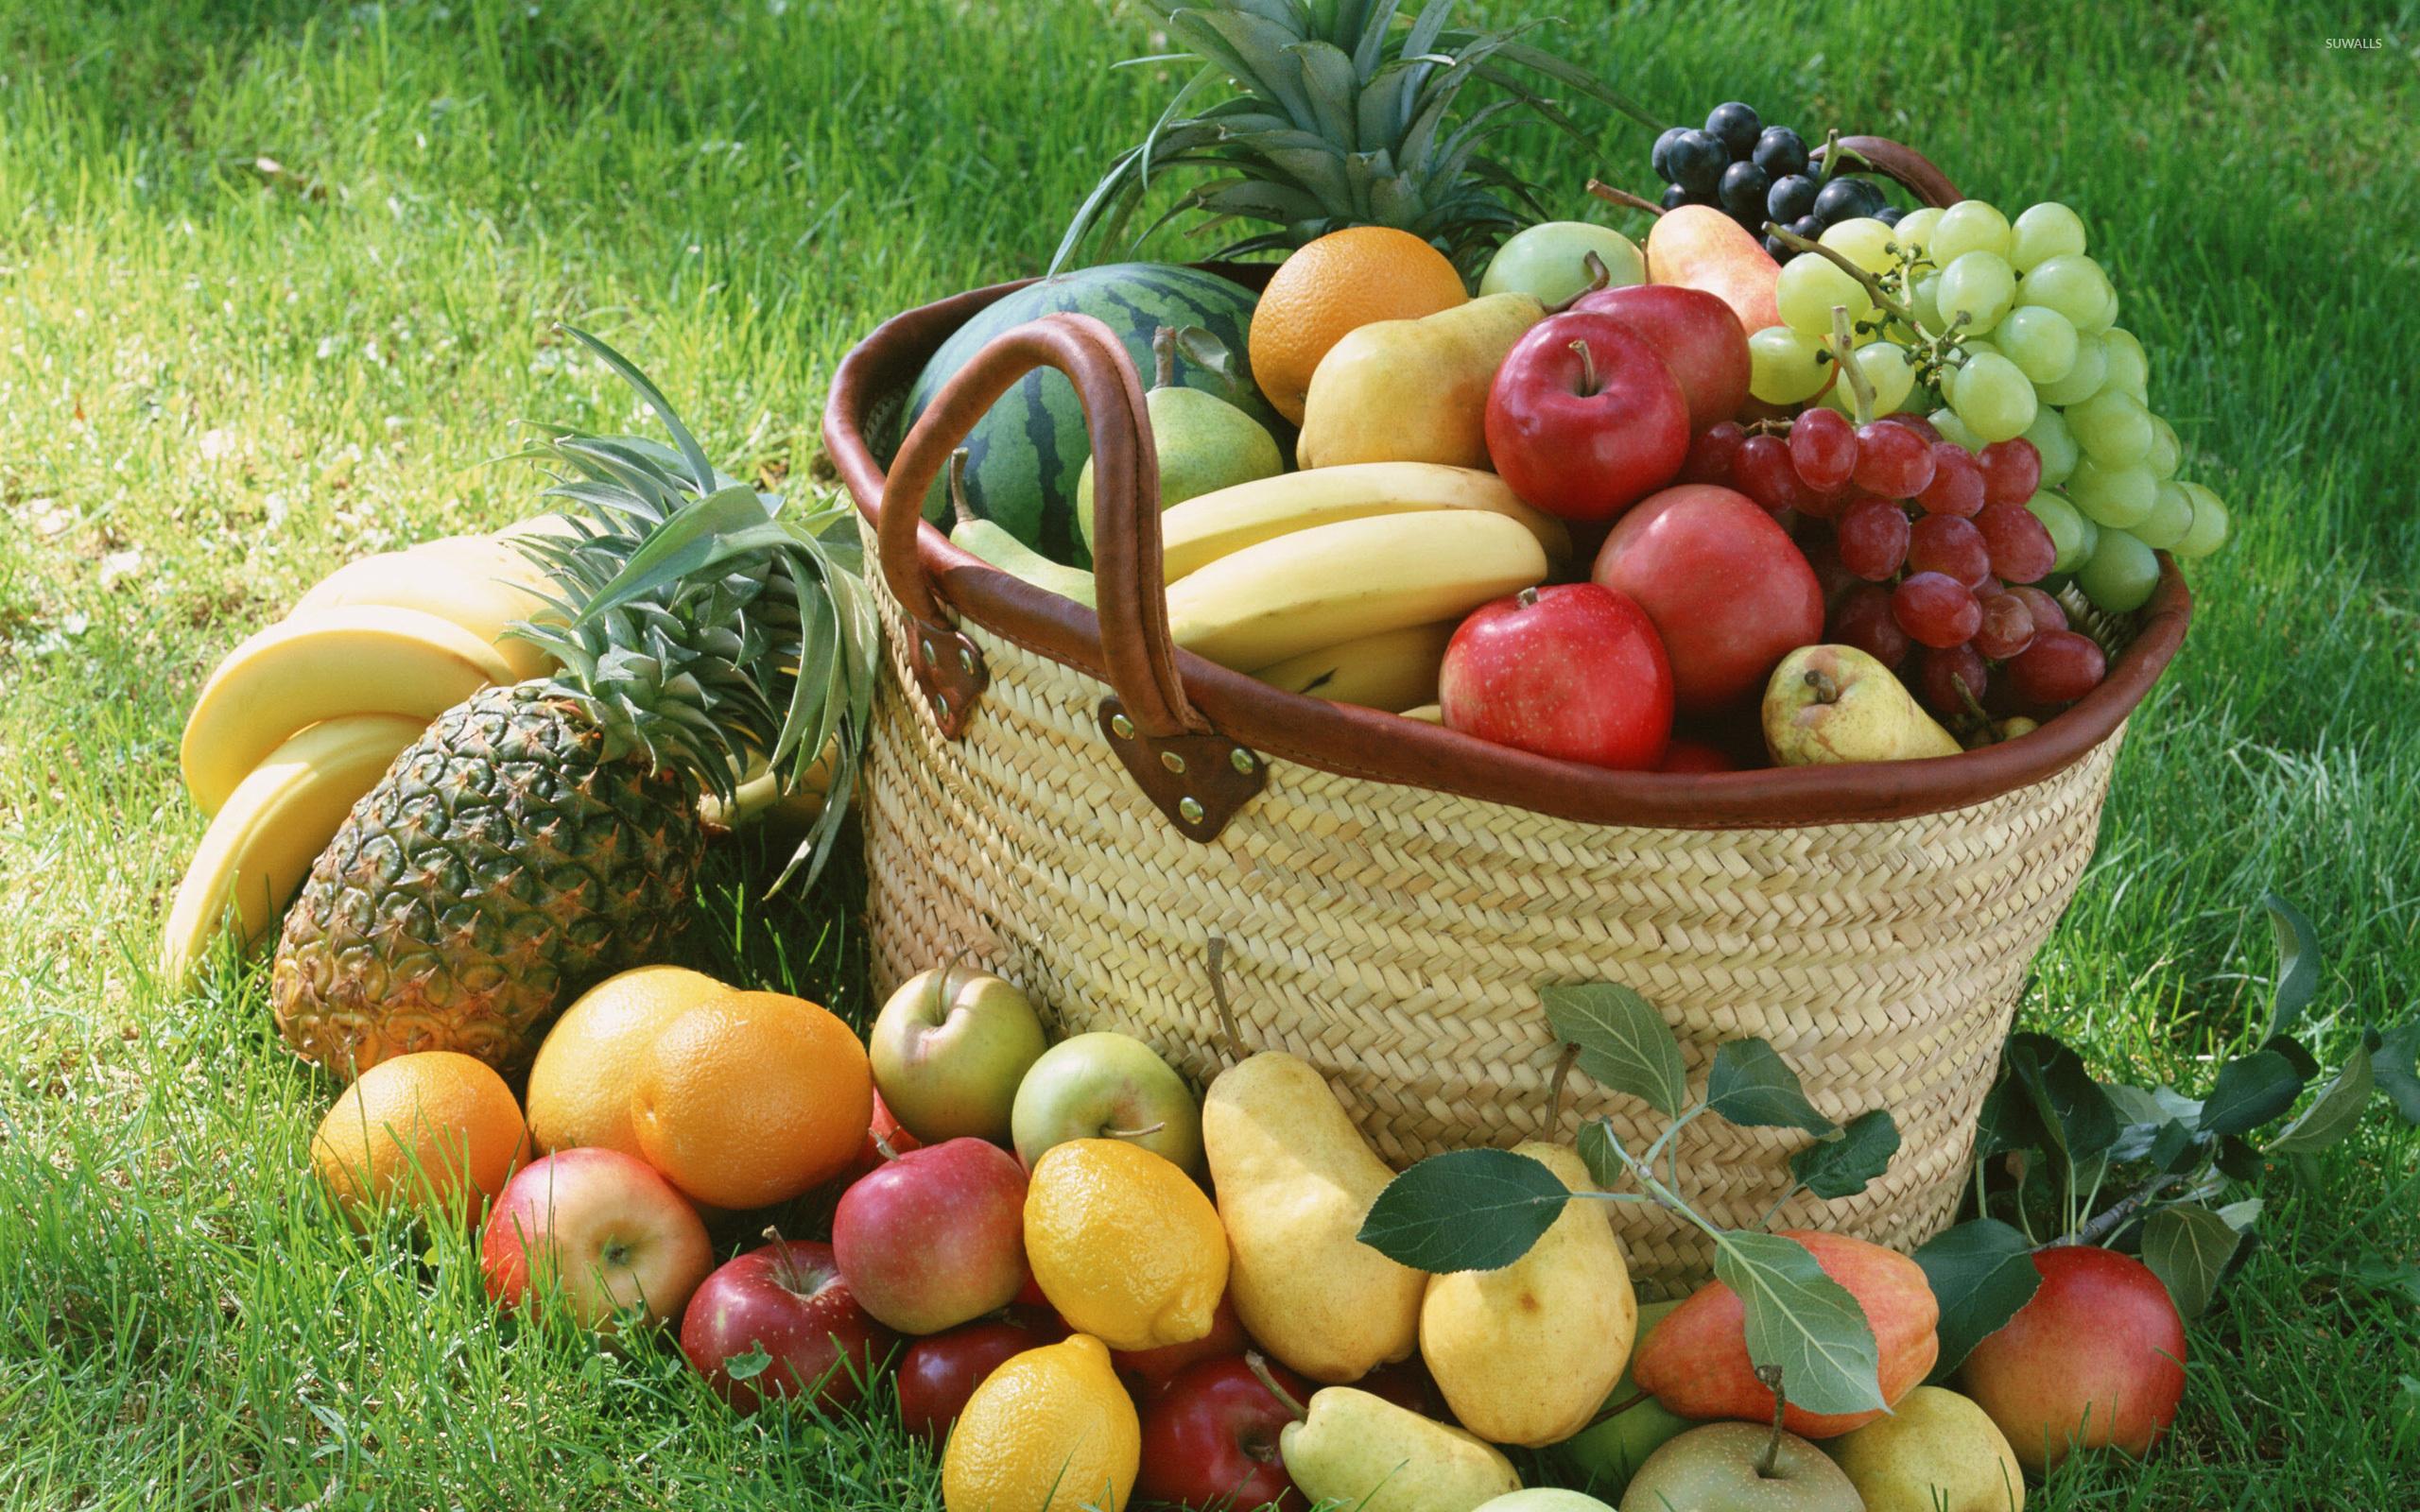 Fruit Basket Wallpaper Photography Wallpapers 7354